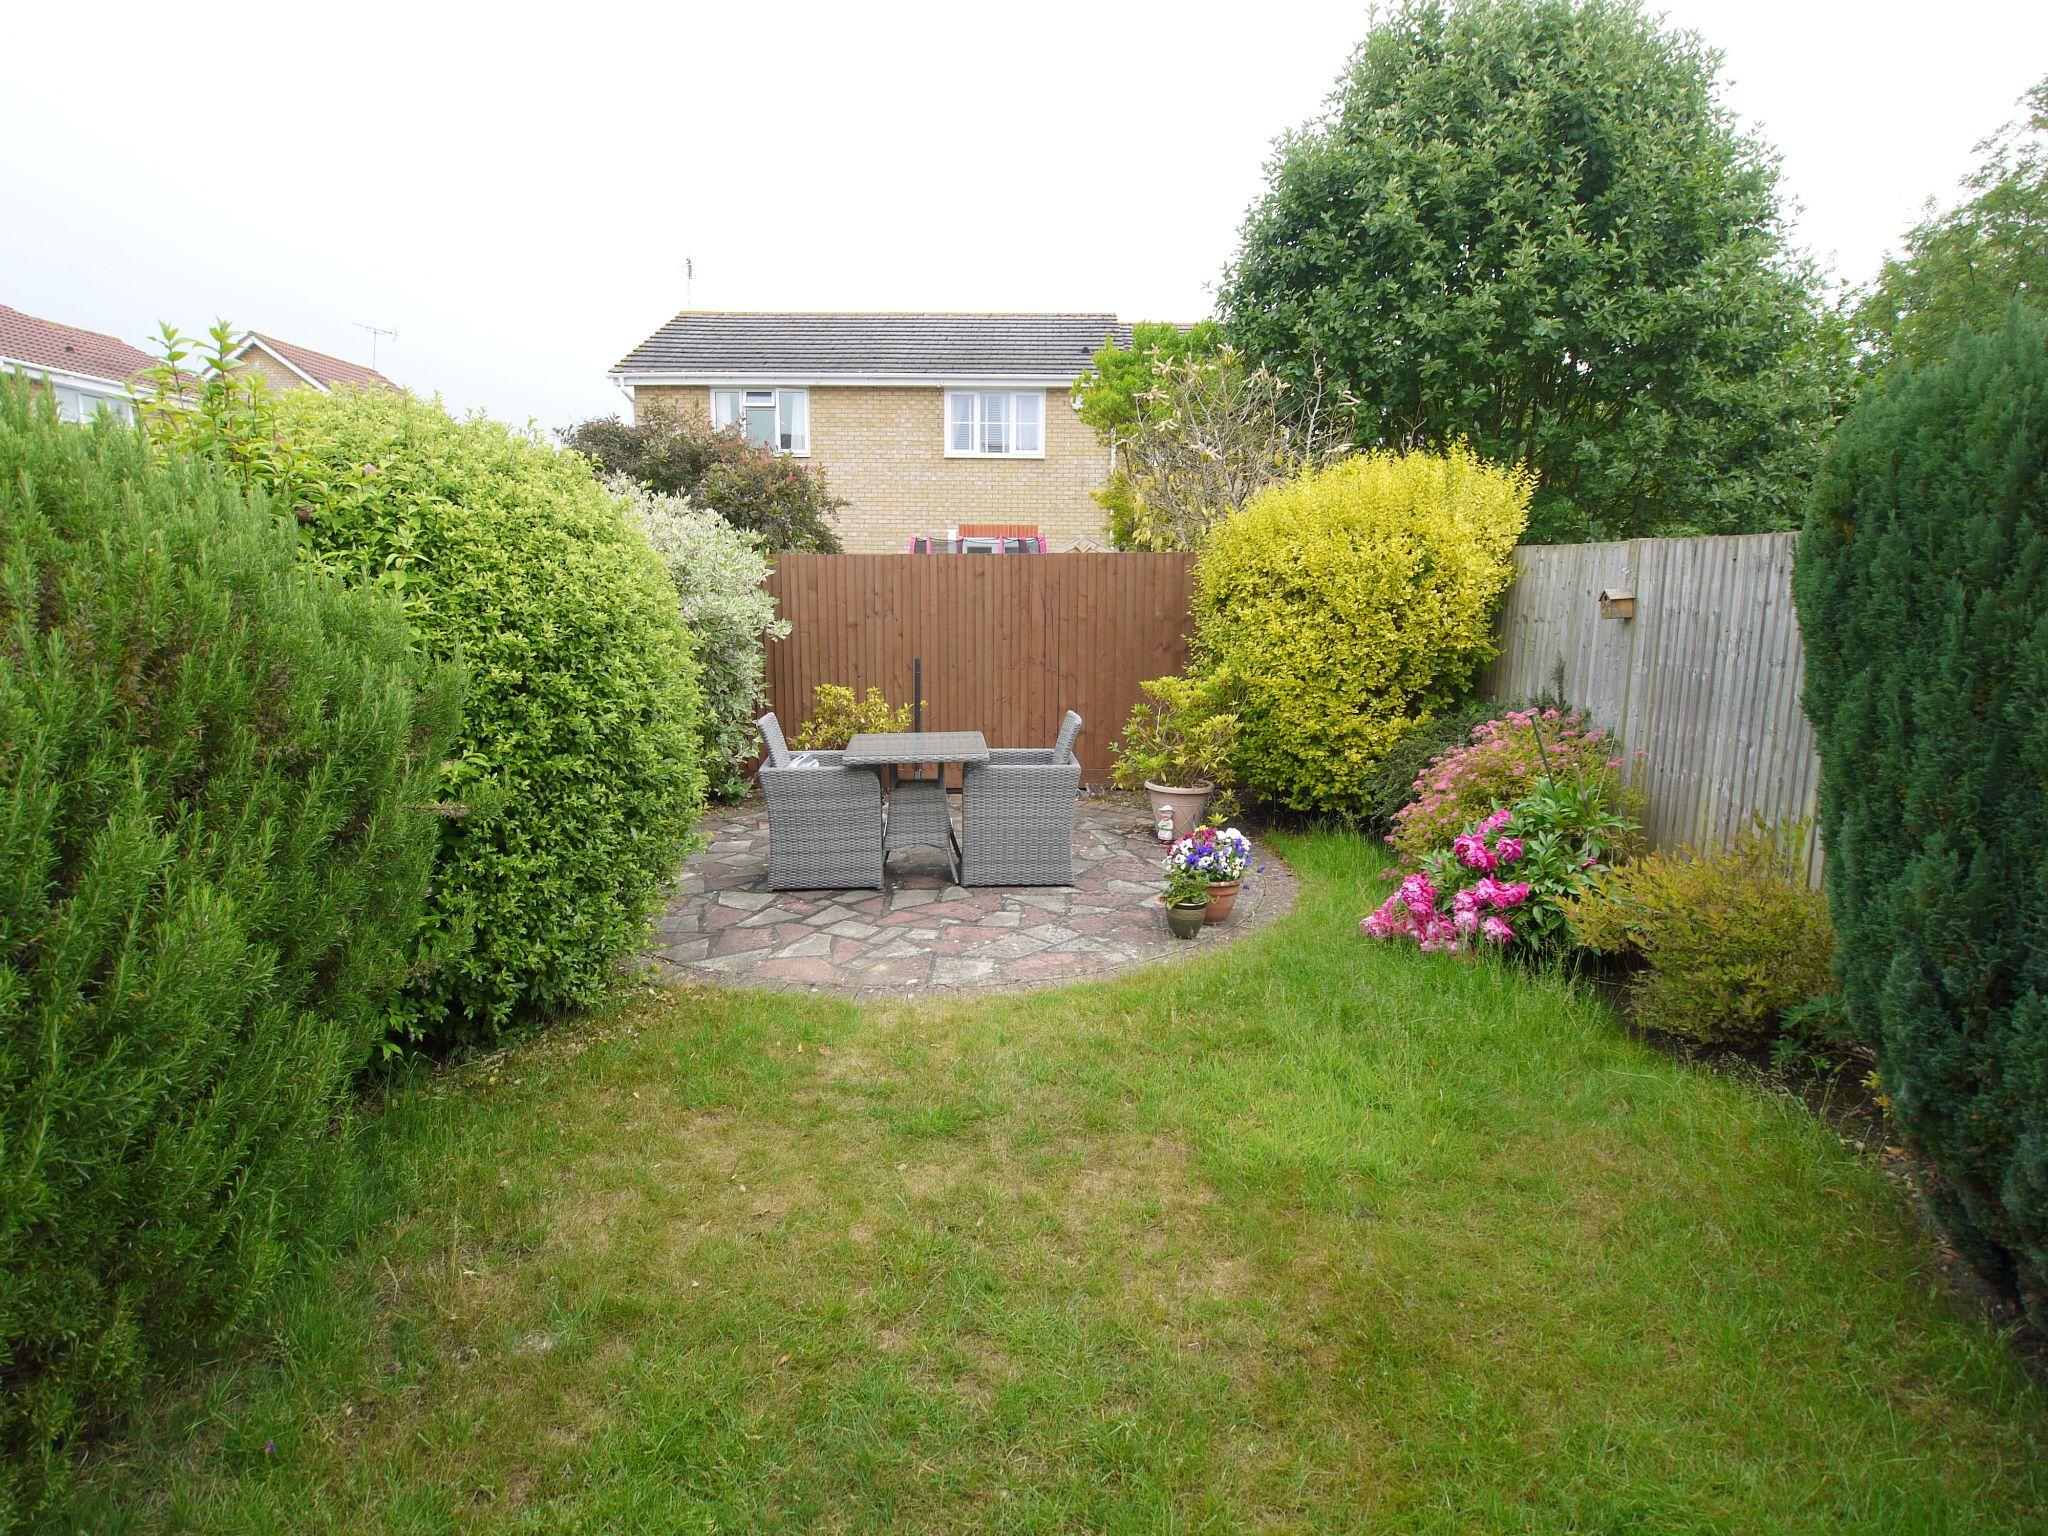 3 bedroom semi-detached house For Sale in Sevenoaks - Photograph 10